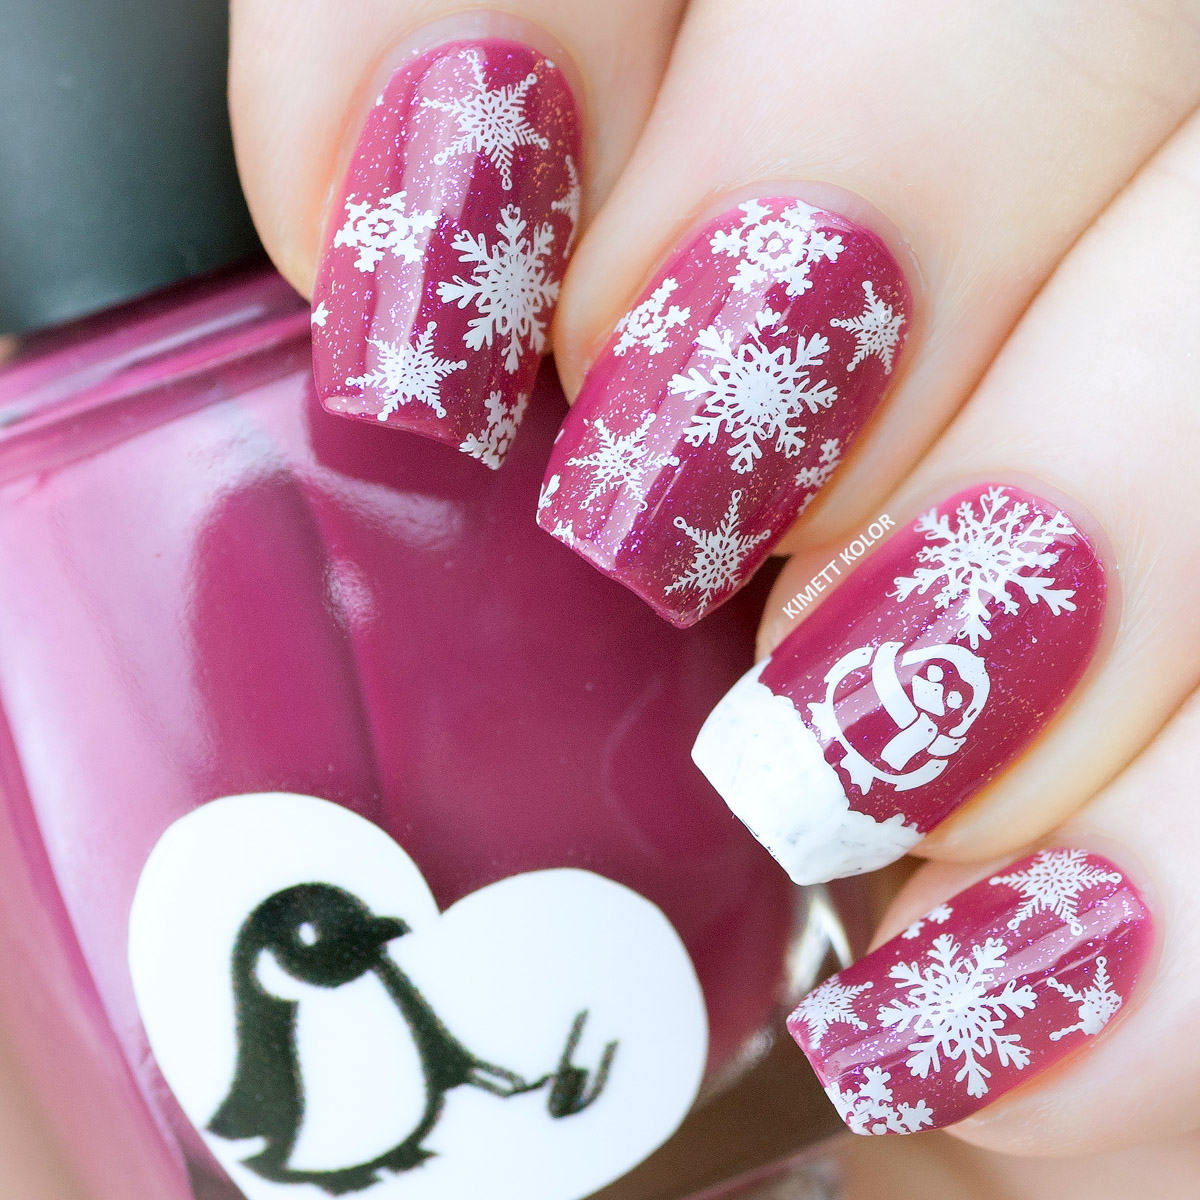 Kimett Kolor Pink Snowflake Penguin Stamping Nail Art